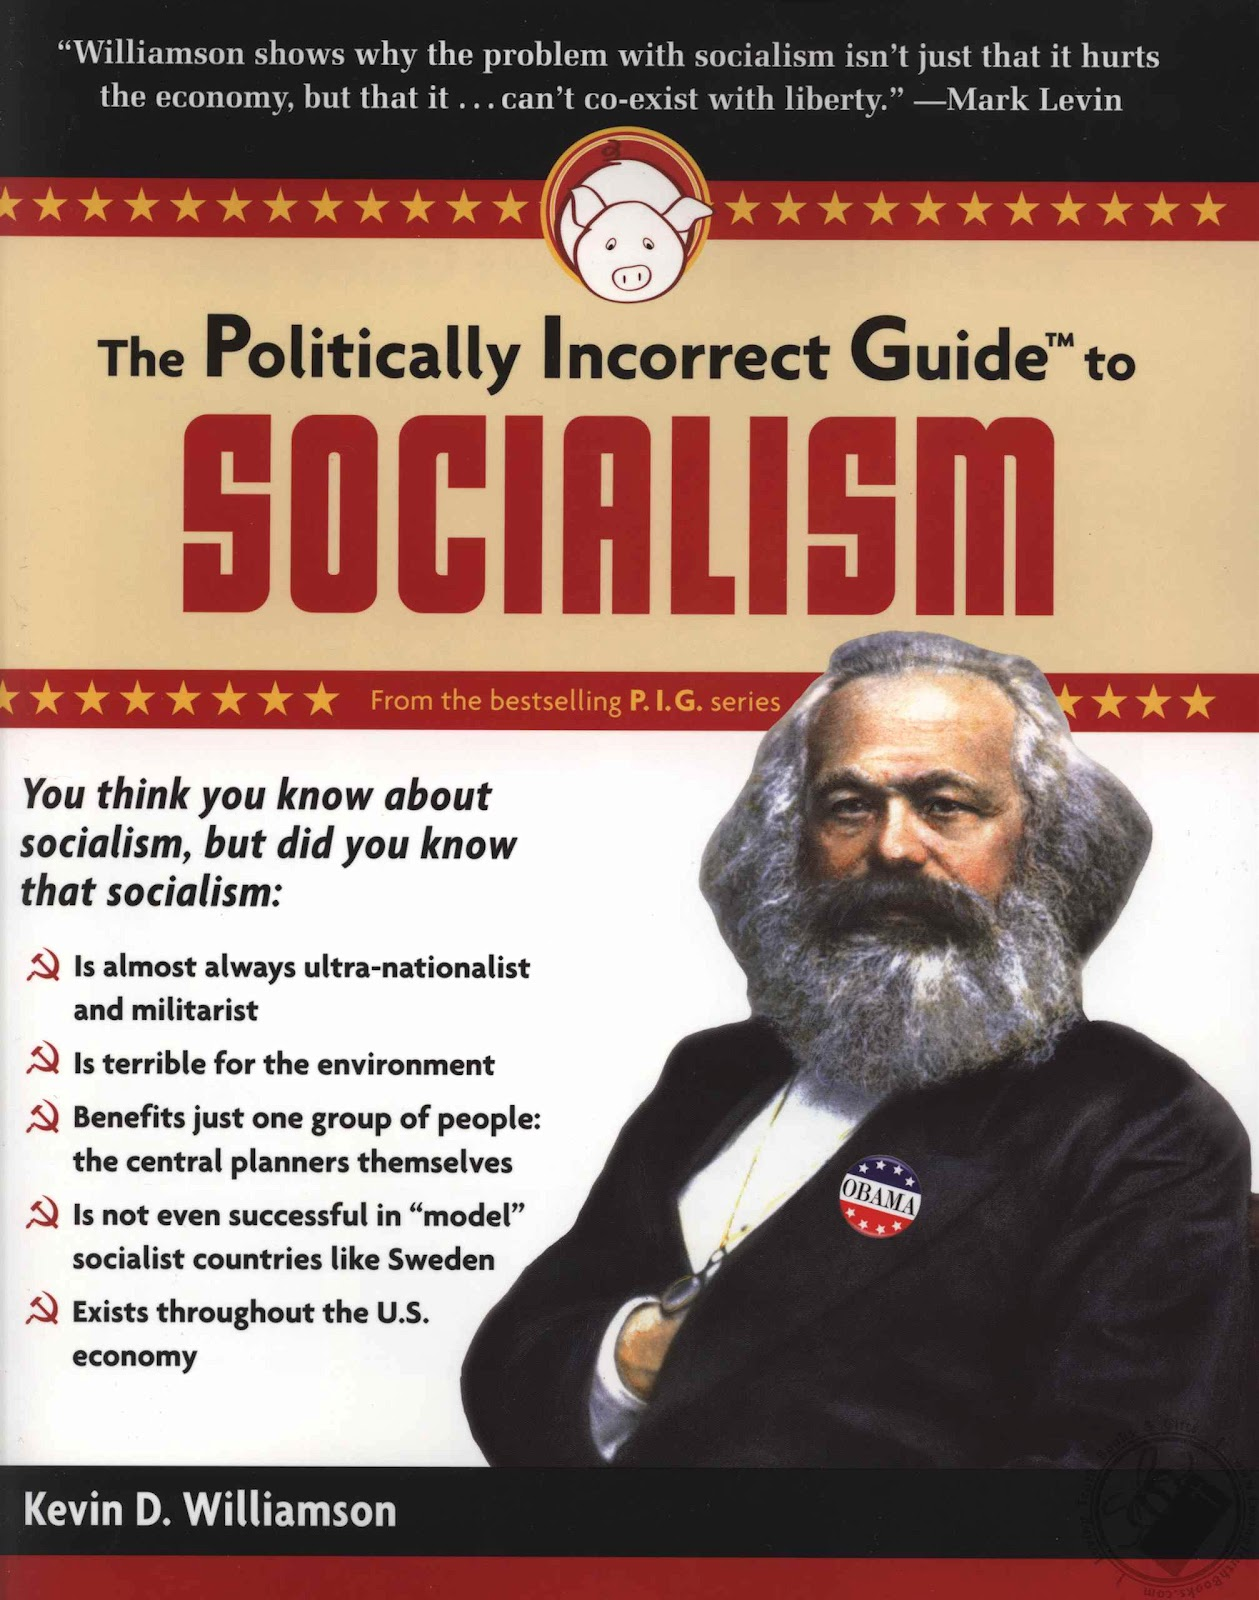 [Image: PIG-socialism.jpg]